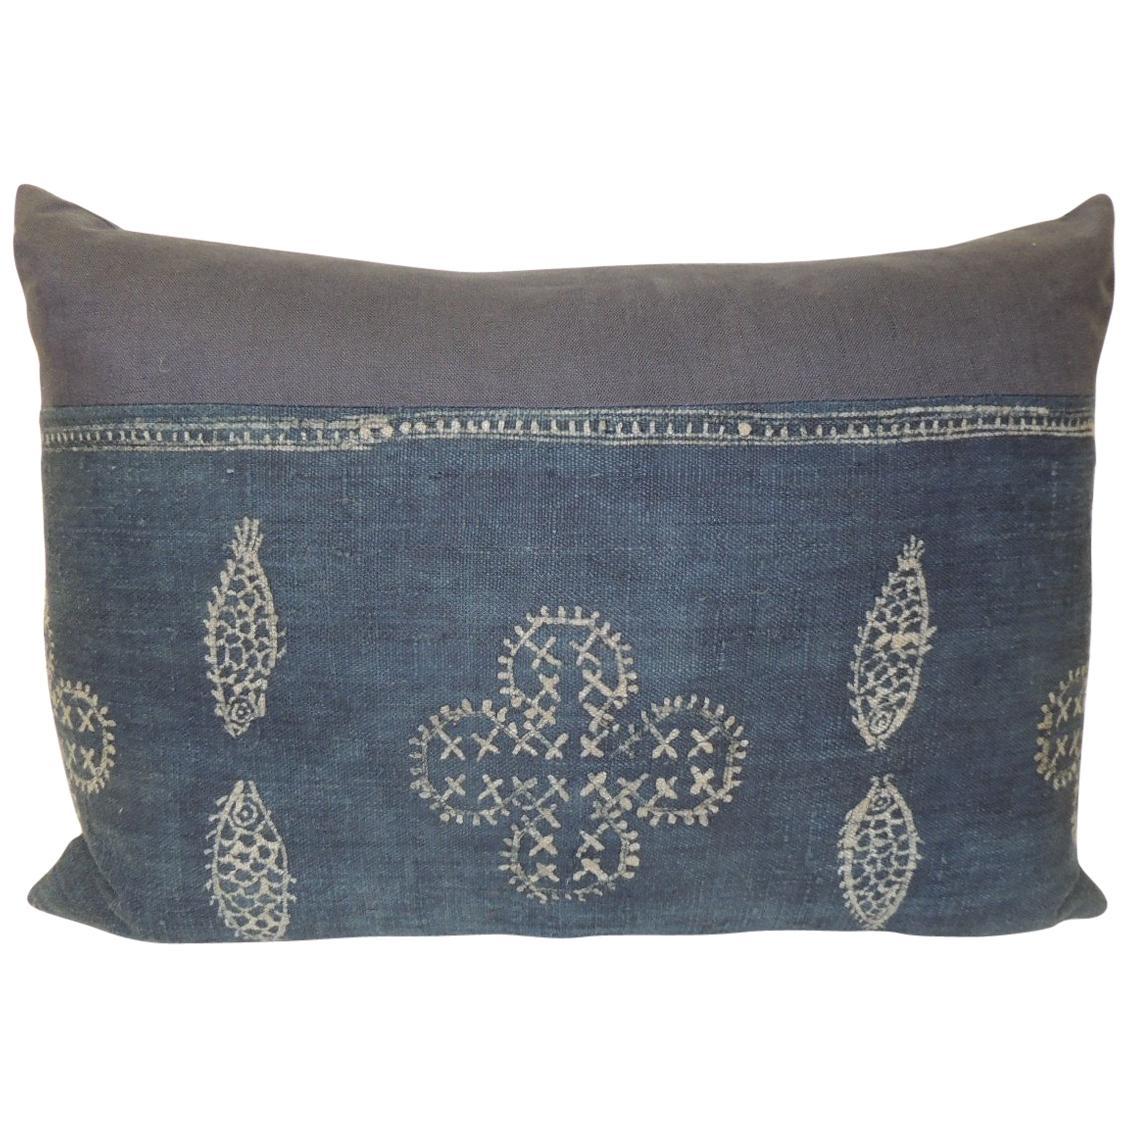 Vintage Asian Indigo and White Hand-Blocked Bolster Decorative Pillow